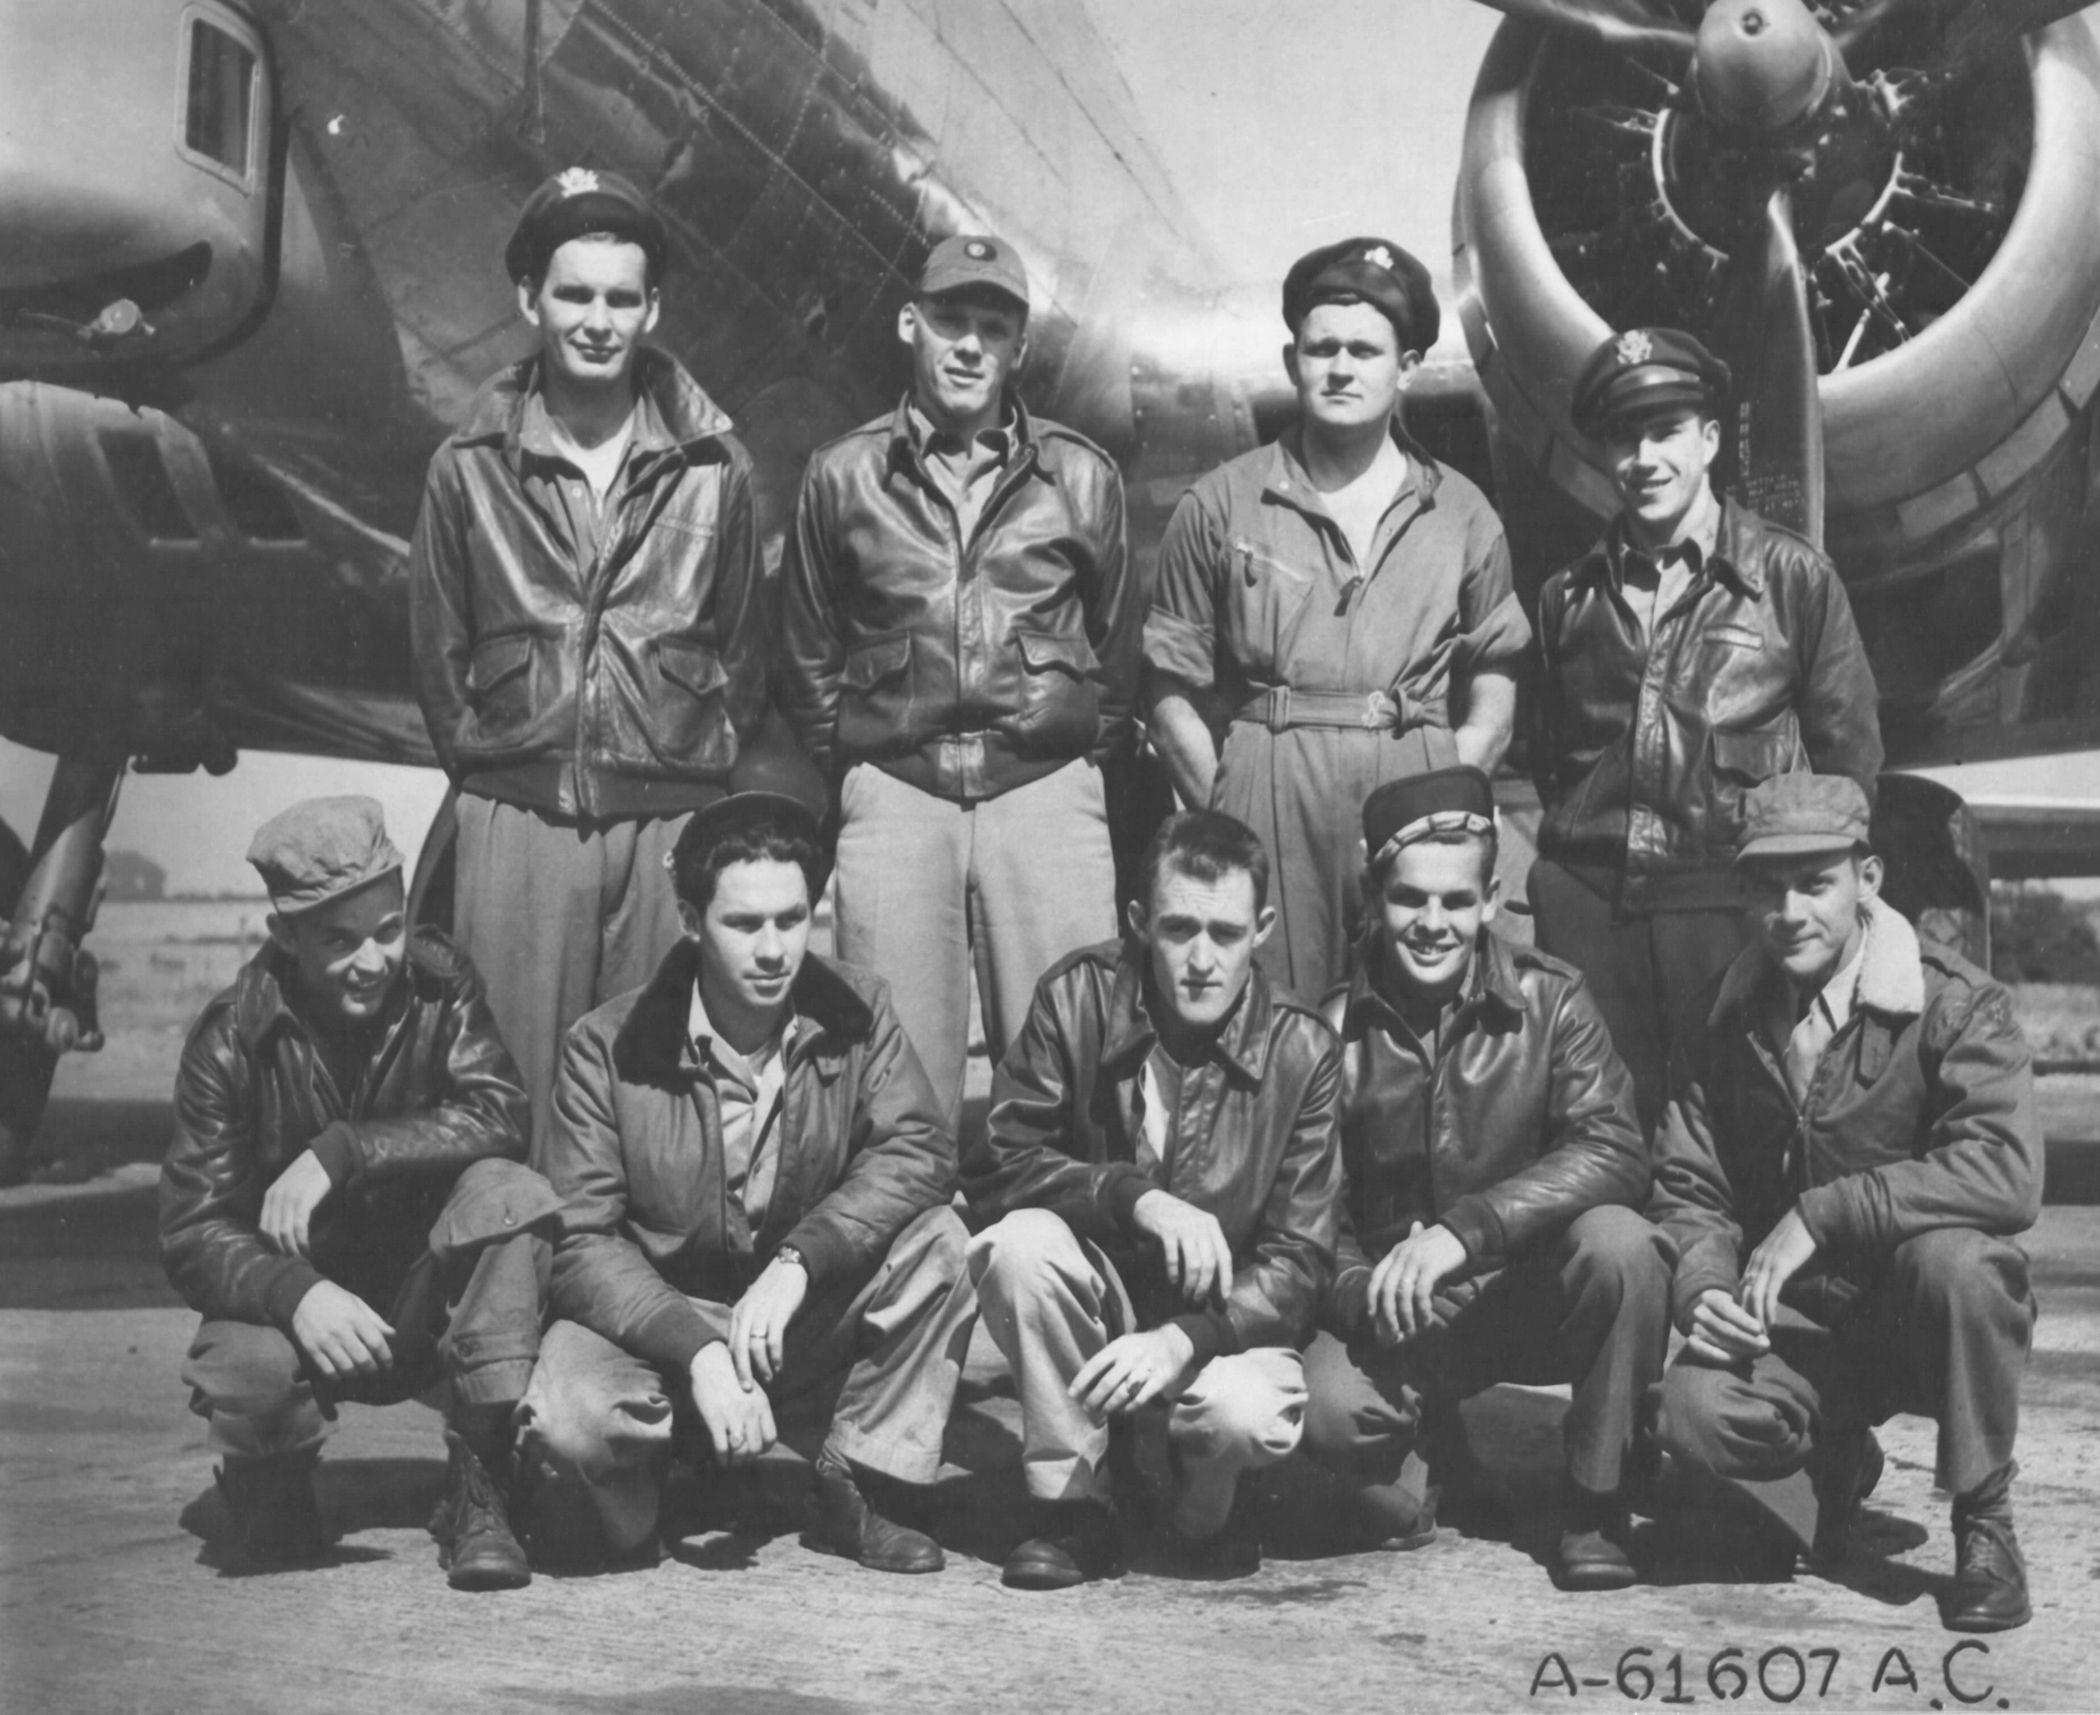 JACK R. HILLARY CREW - 359th BS  (crew assigned 359BS: 16 July 1944)(Back L-R) 2Lt Jack R. Hillary (P-KIA); 2Lt William Robertson III (CP-KIA); 2Lt John E. Rice (N-KIA); 2Lt Rocco De Filippis (B-KIA) (Front L-R) Sgt Neldon Reid Bishop(BT-POW)(1 );S/Sgt George E. Paul (E-KIA); Sgt Harry R. Sansum (WG-KIA)(2);  S/Sgt Eugene E. Girman (R-POW)(1); Sgt James R. Watson (TG-POW) Photo courtesy of  www.303rdBG.com .